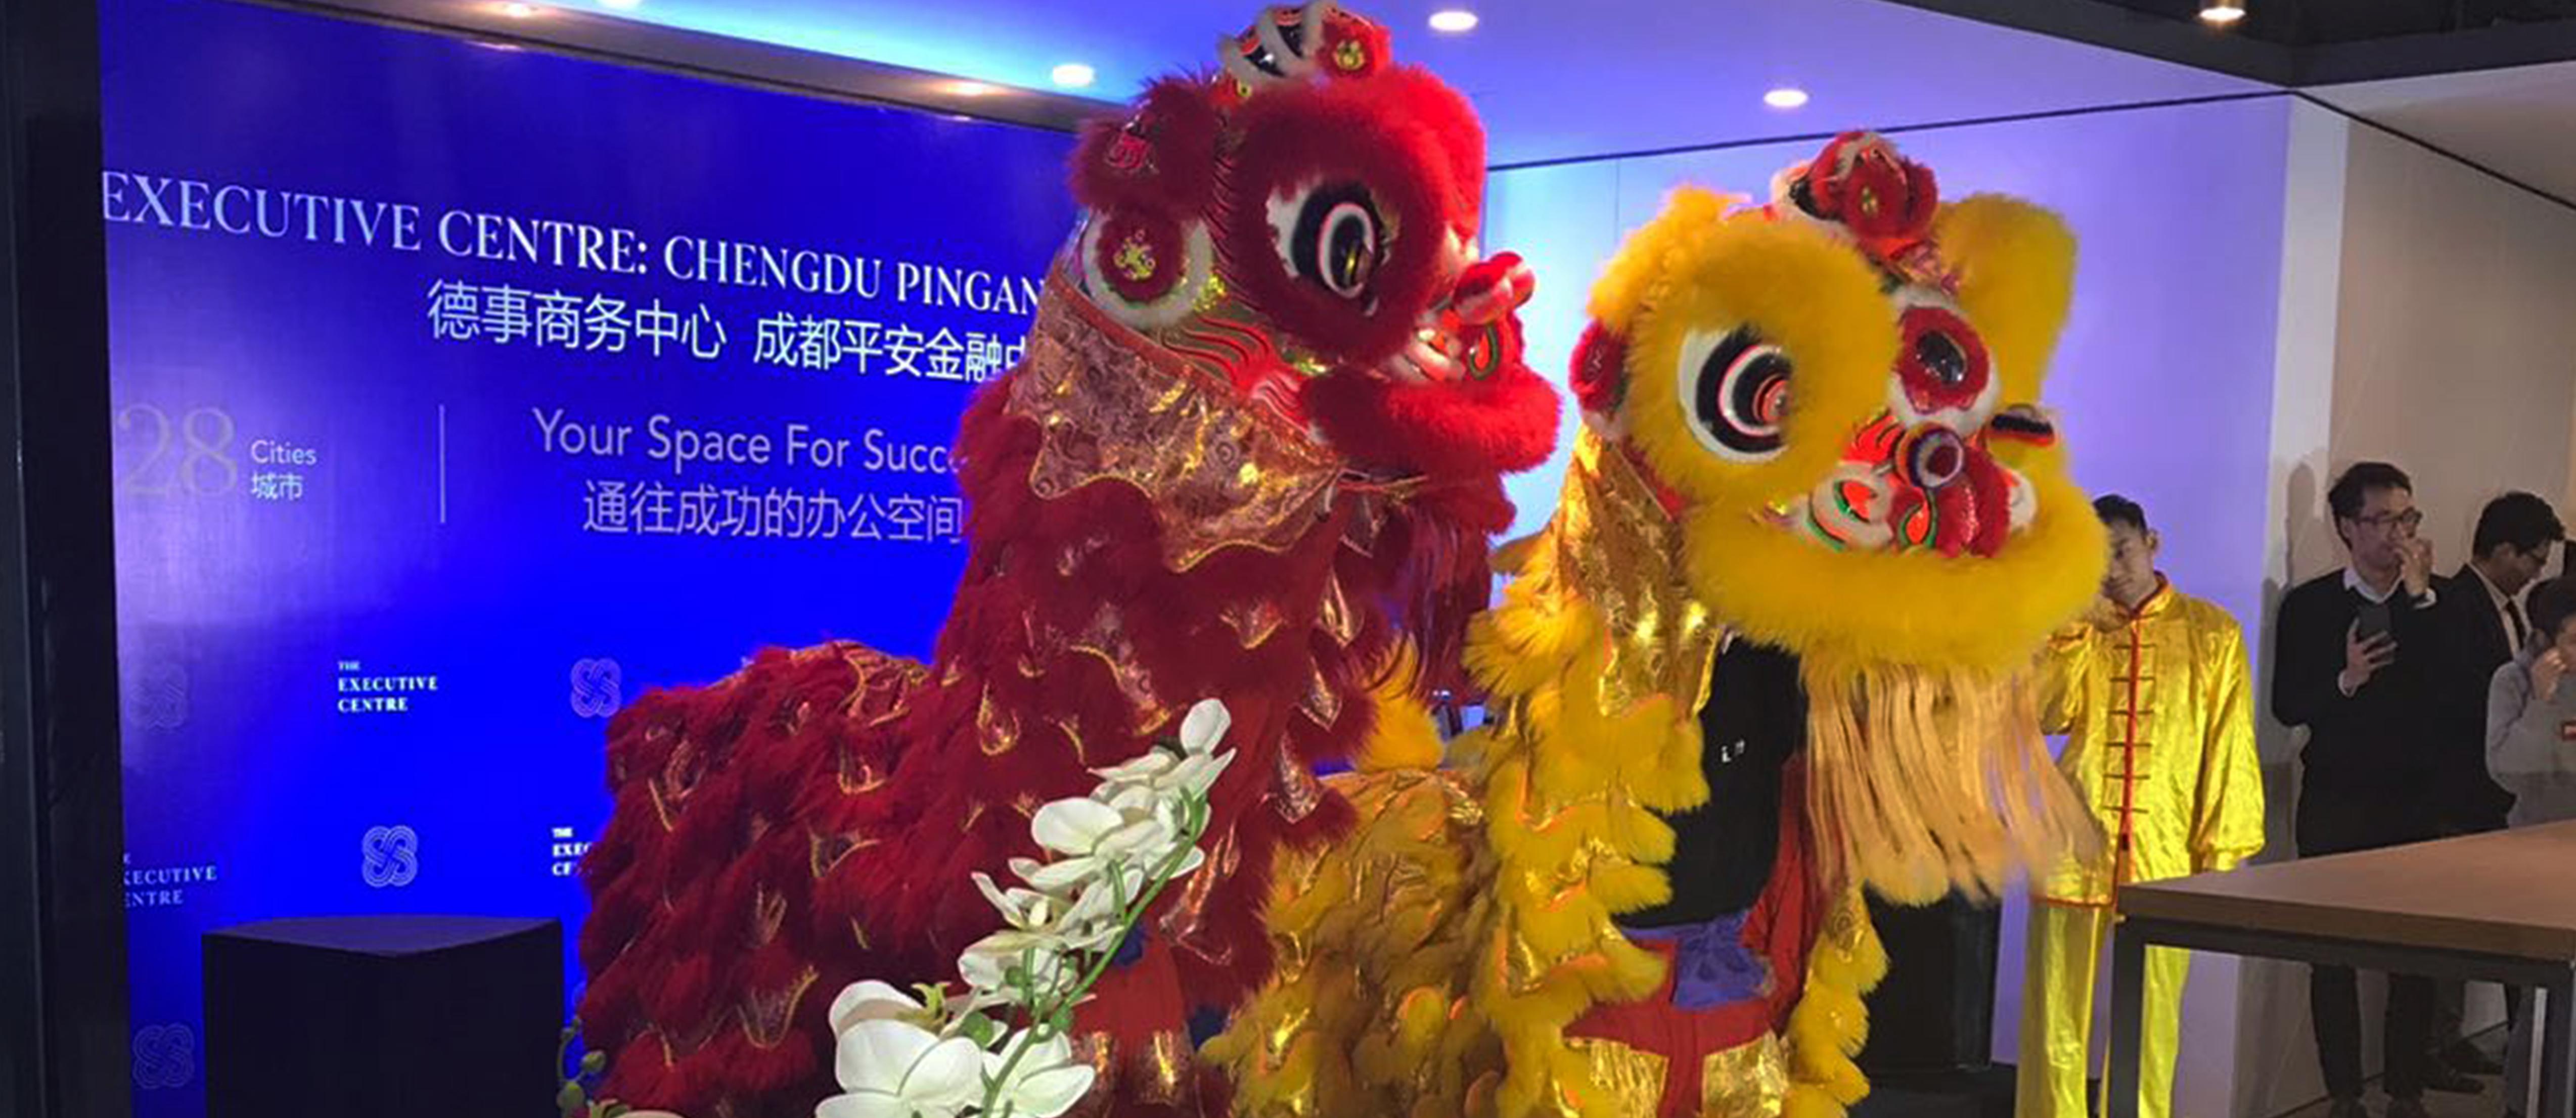 Chengdu-event